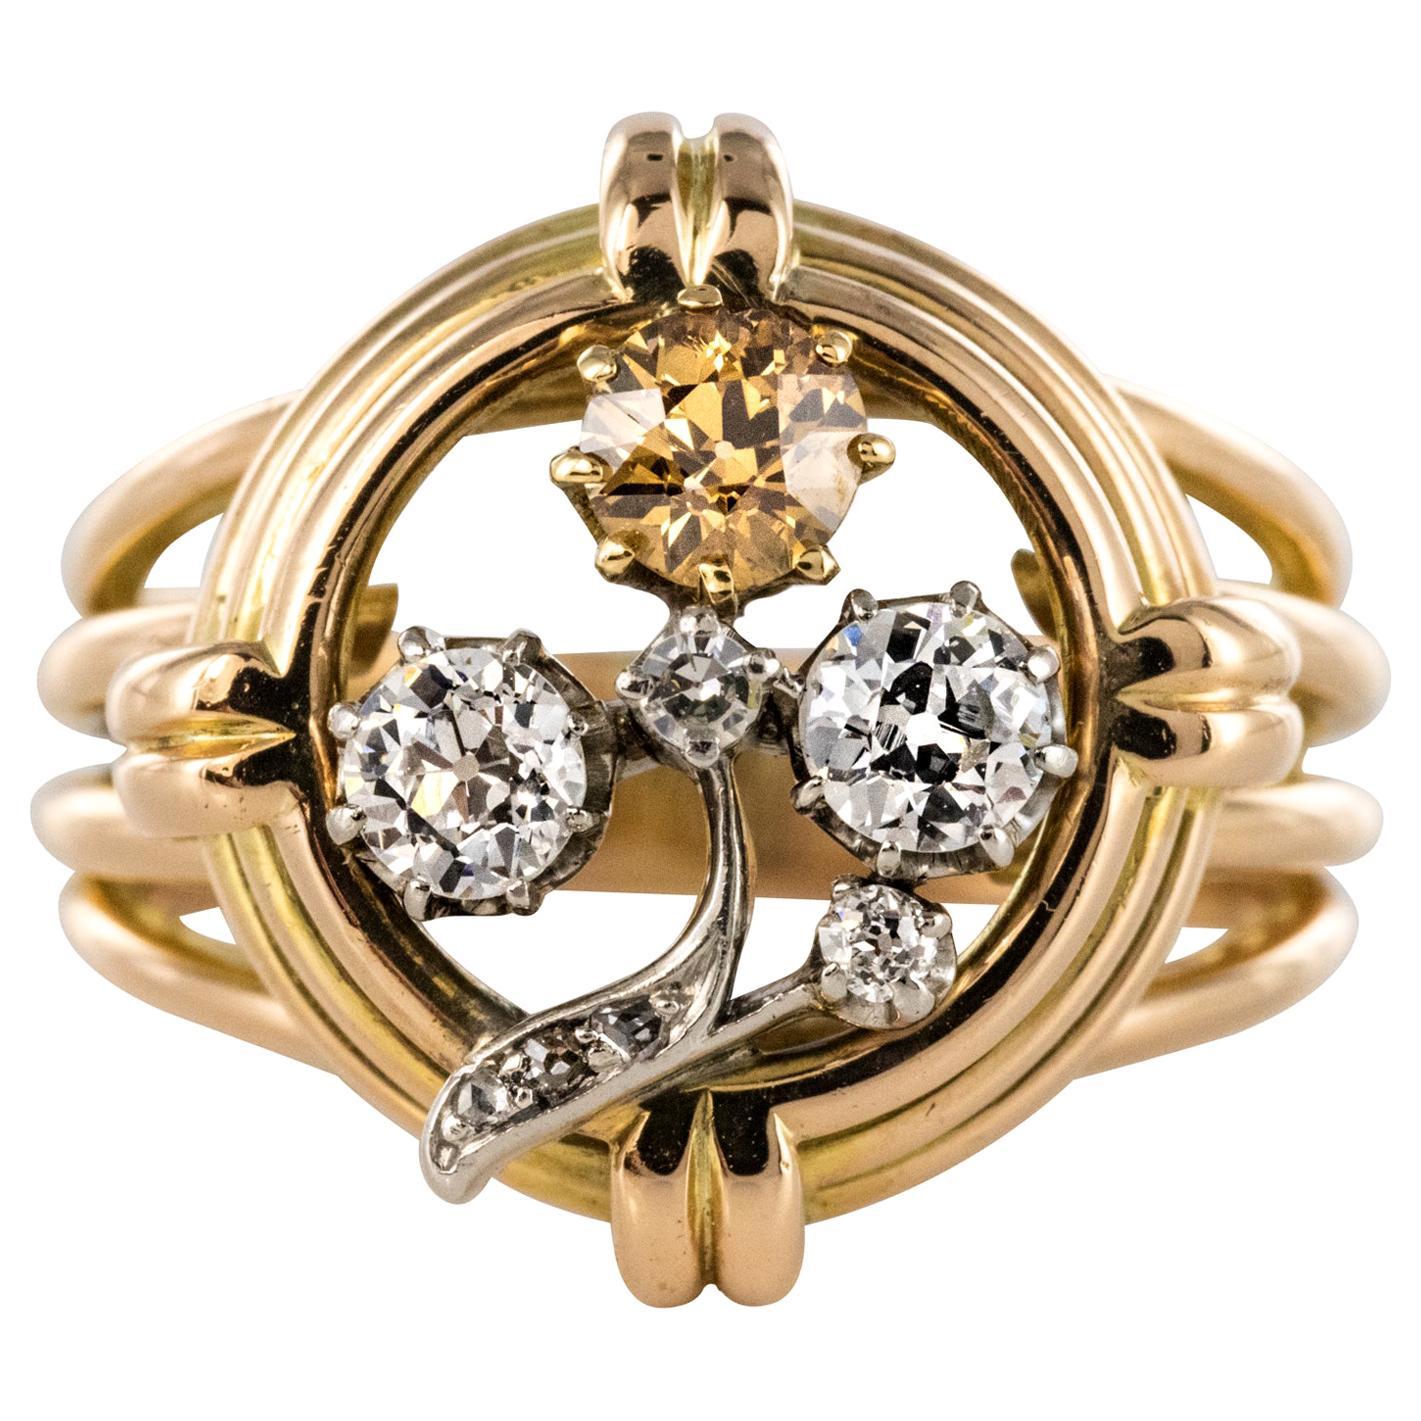 1940s Retro Diamonds 18 Karat Yellow Gold Clover Ring